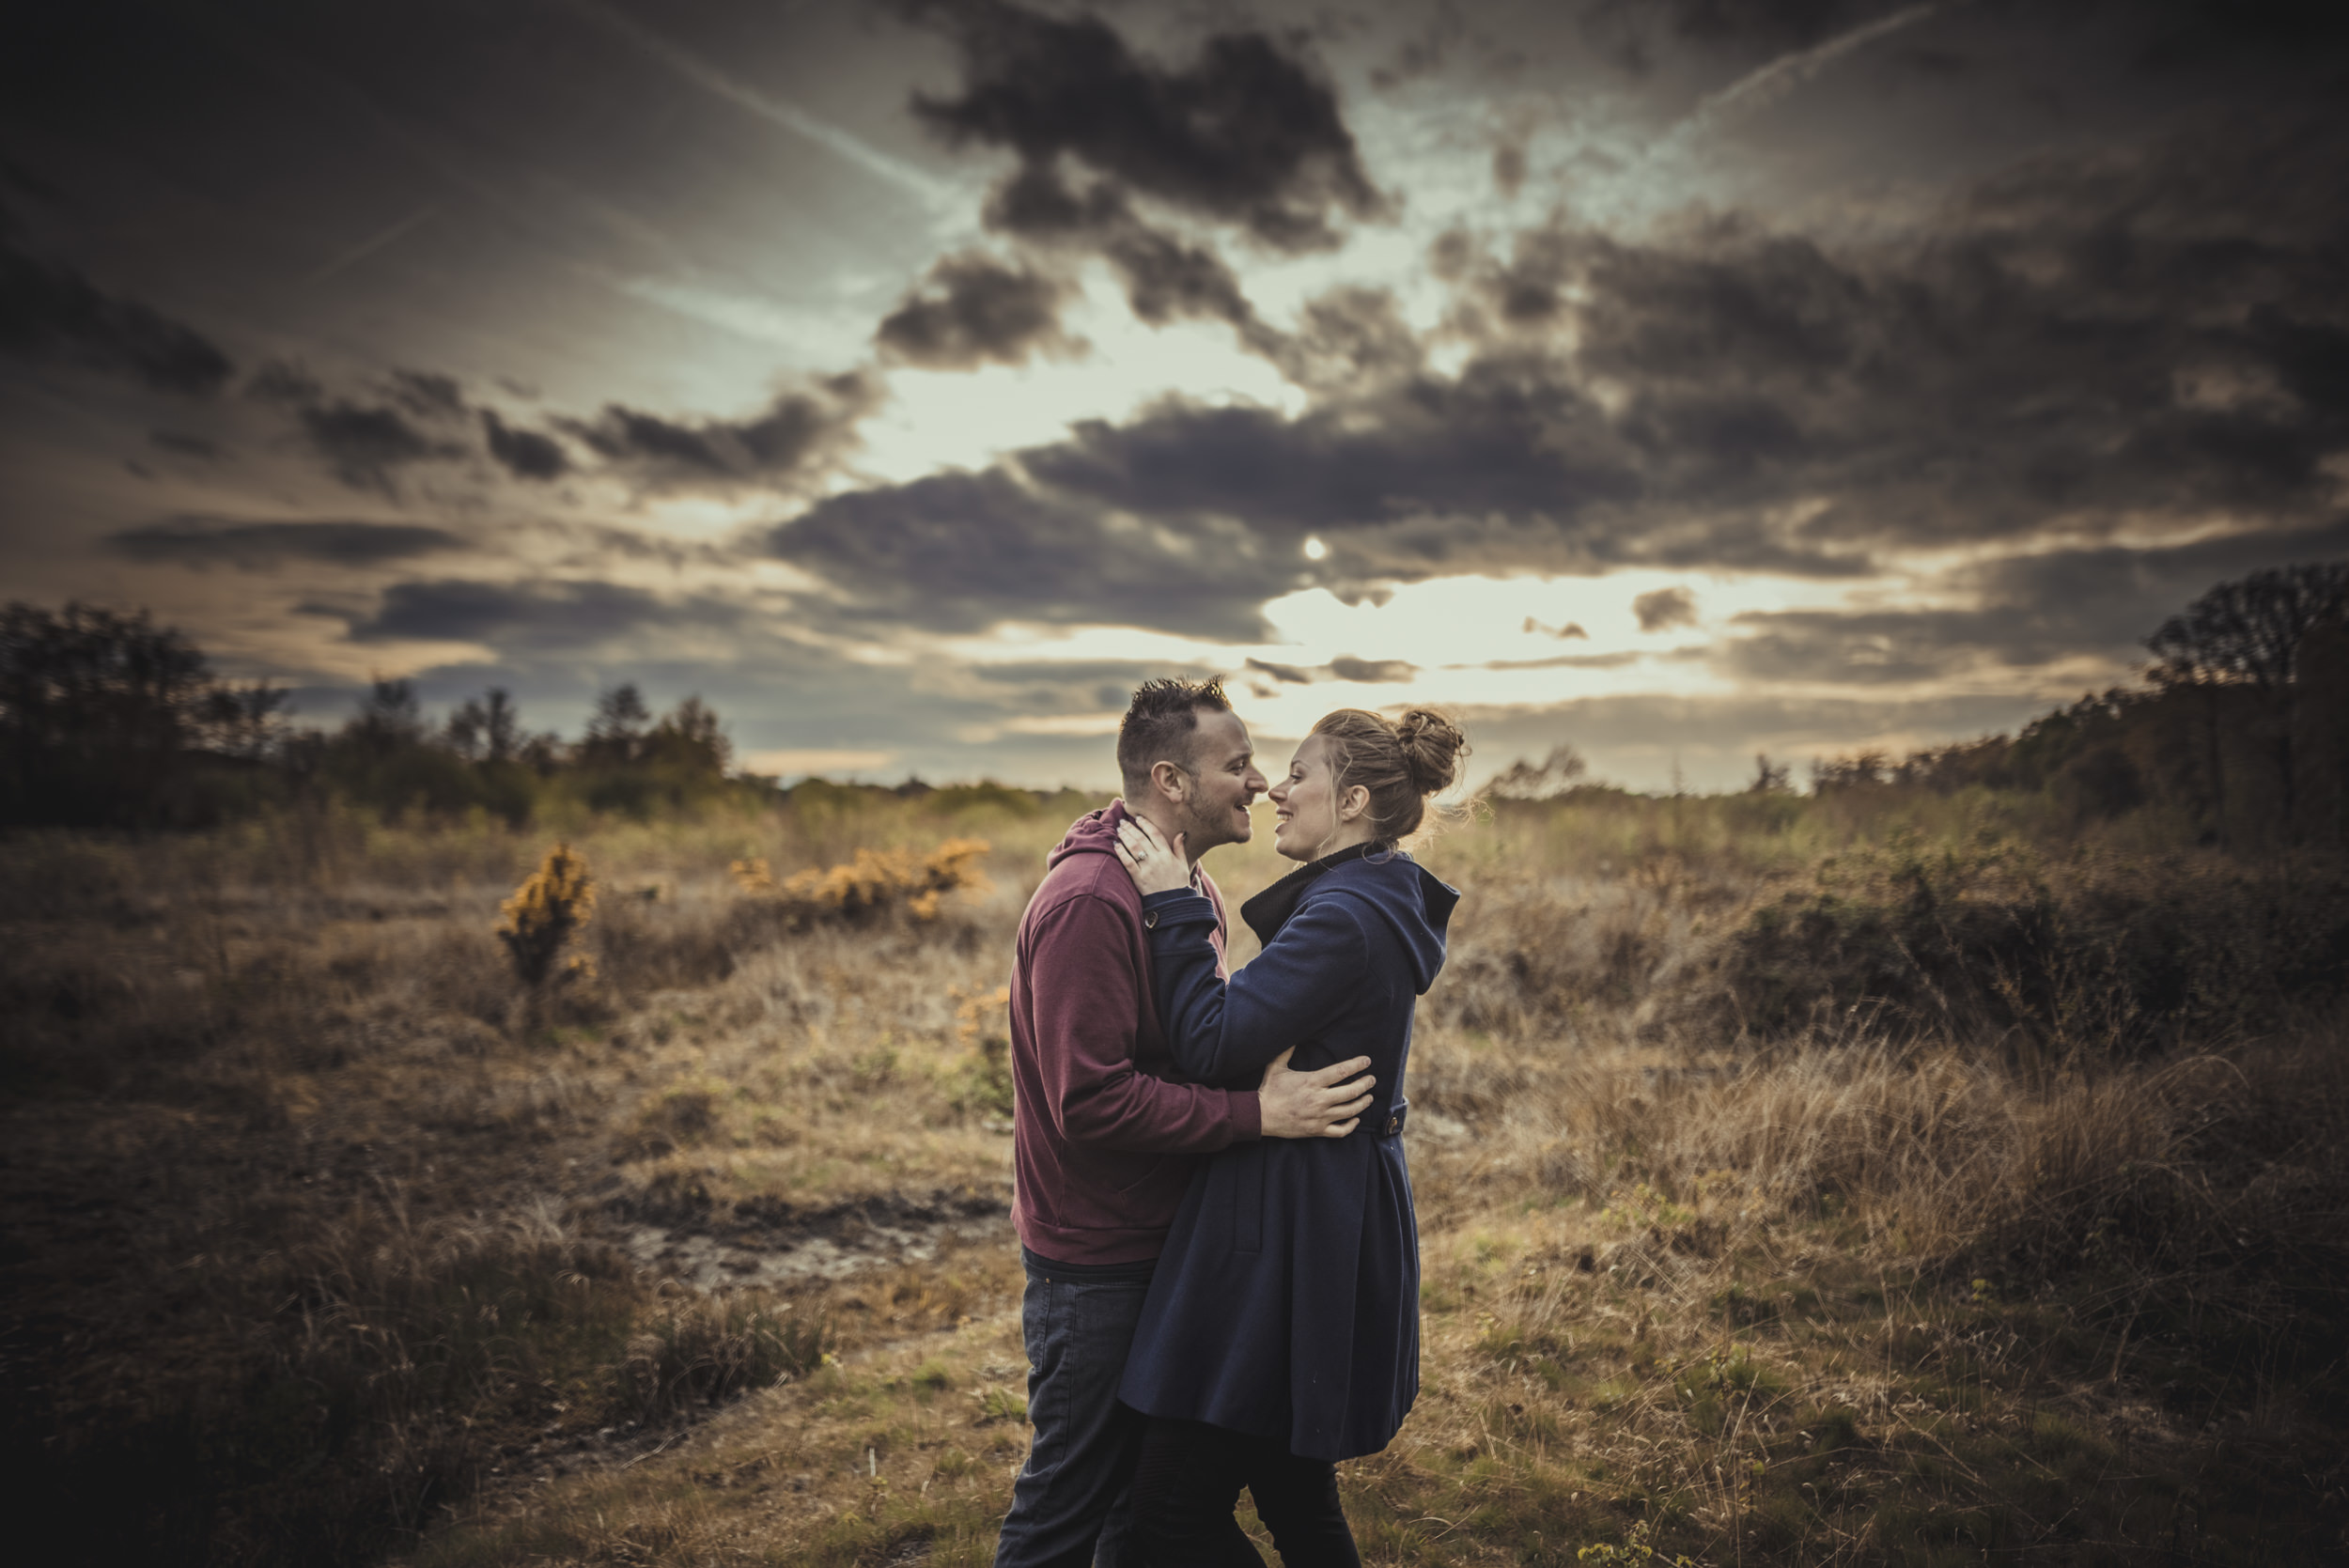 Hannah-and-Sam-Engagement-Sesion-in-Fleet-Pond-Hampshire-Manu-Mendoza-Wedding-Photography-061.jpg